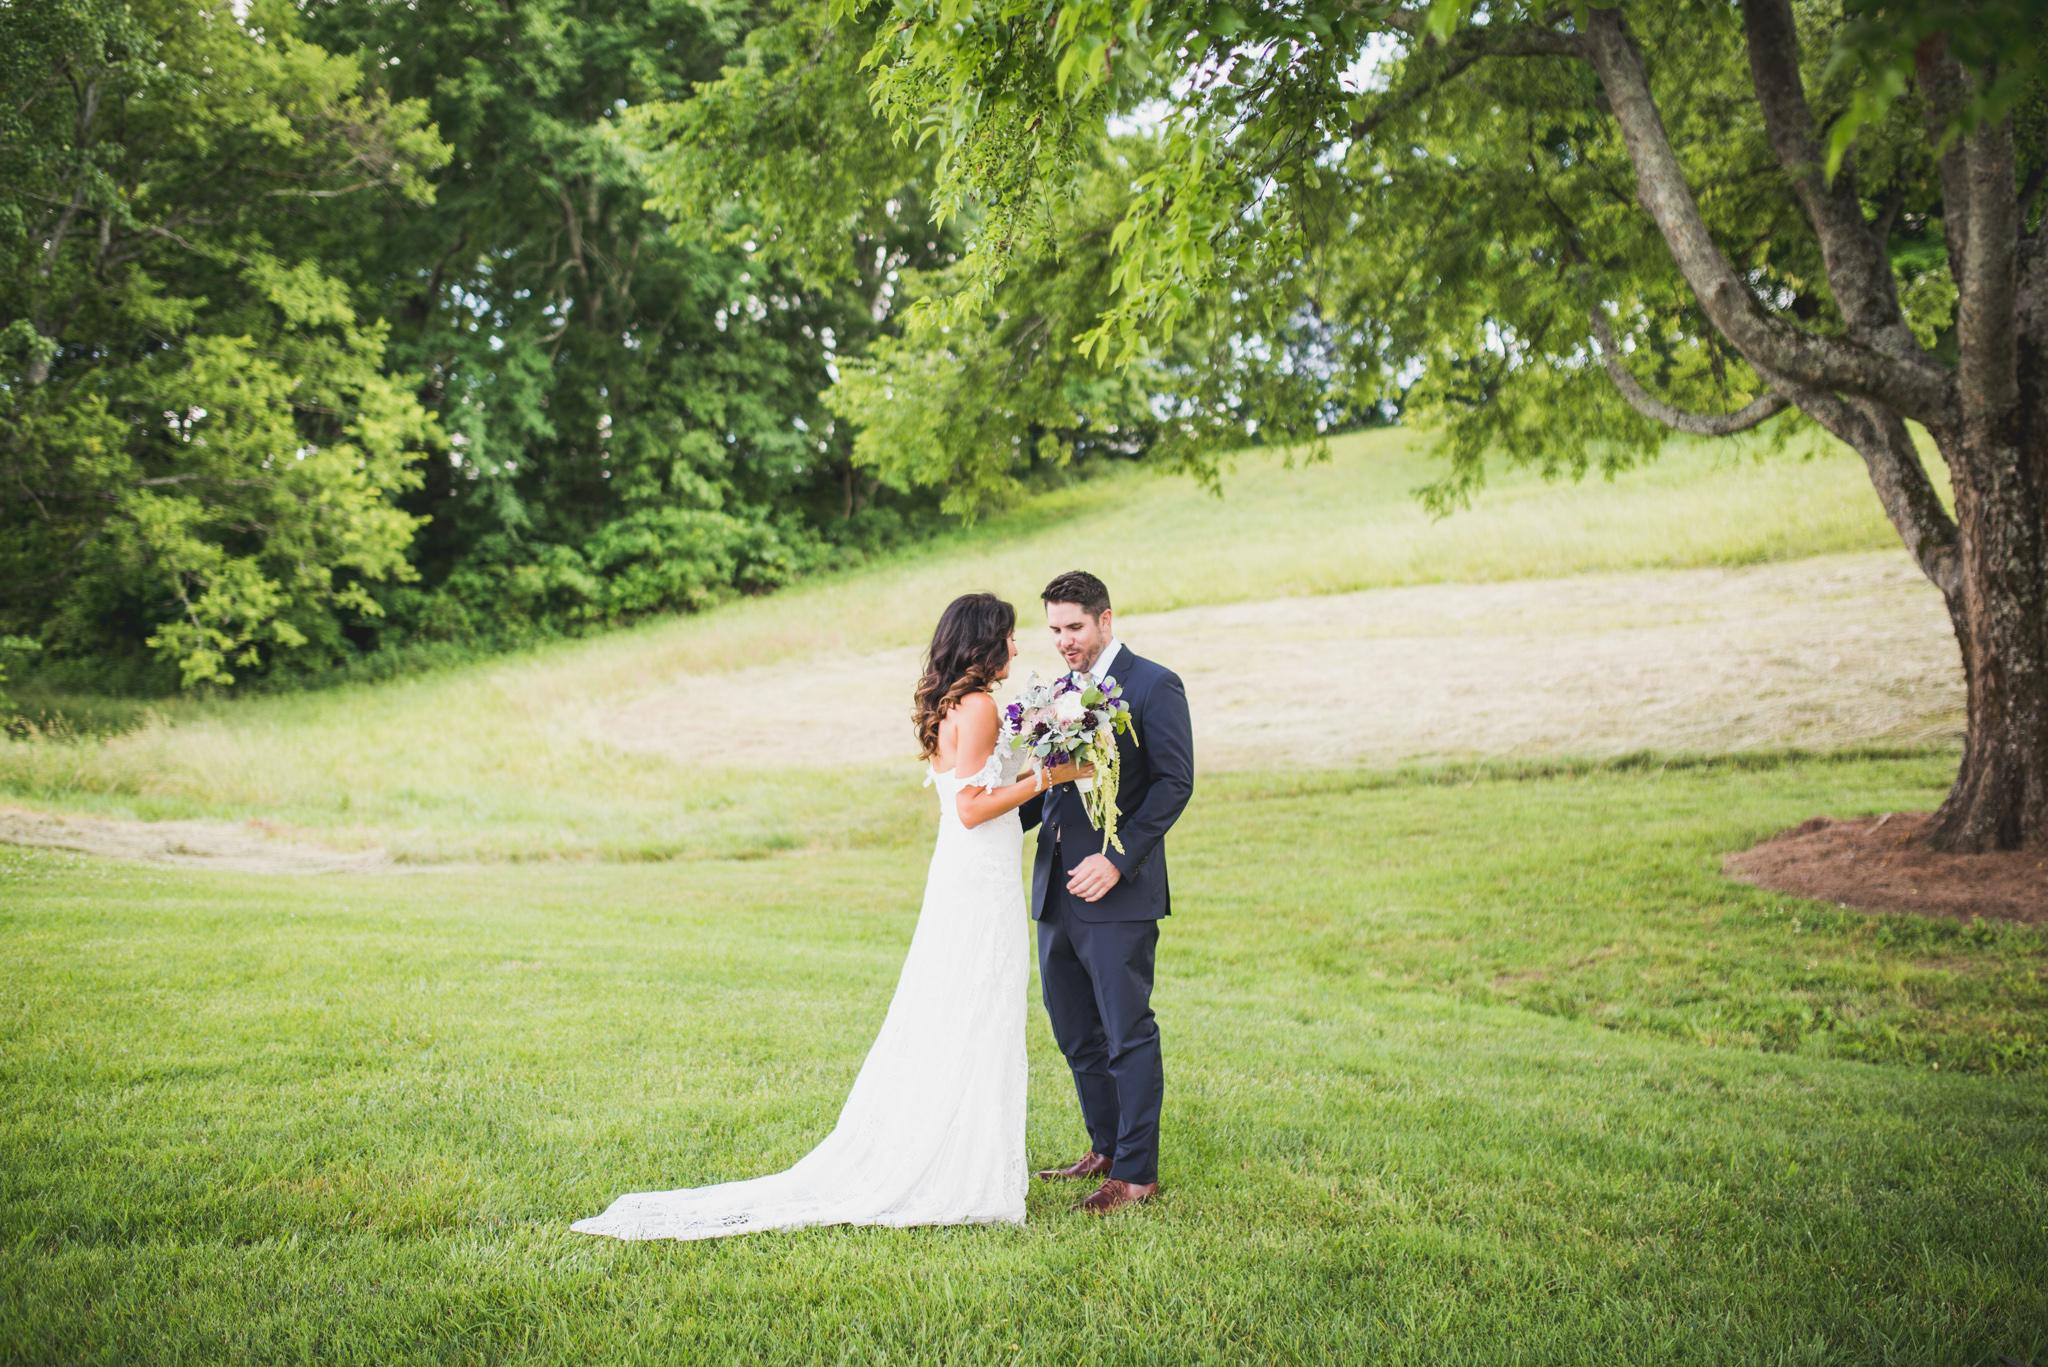 Mint Springs Farm Nashville TN Wedding Photographers22.jpg